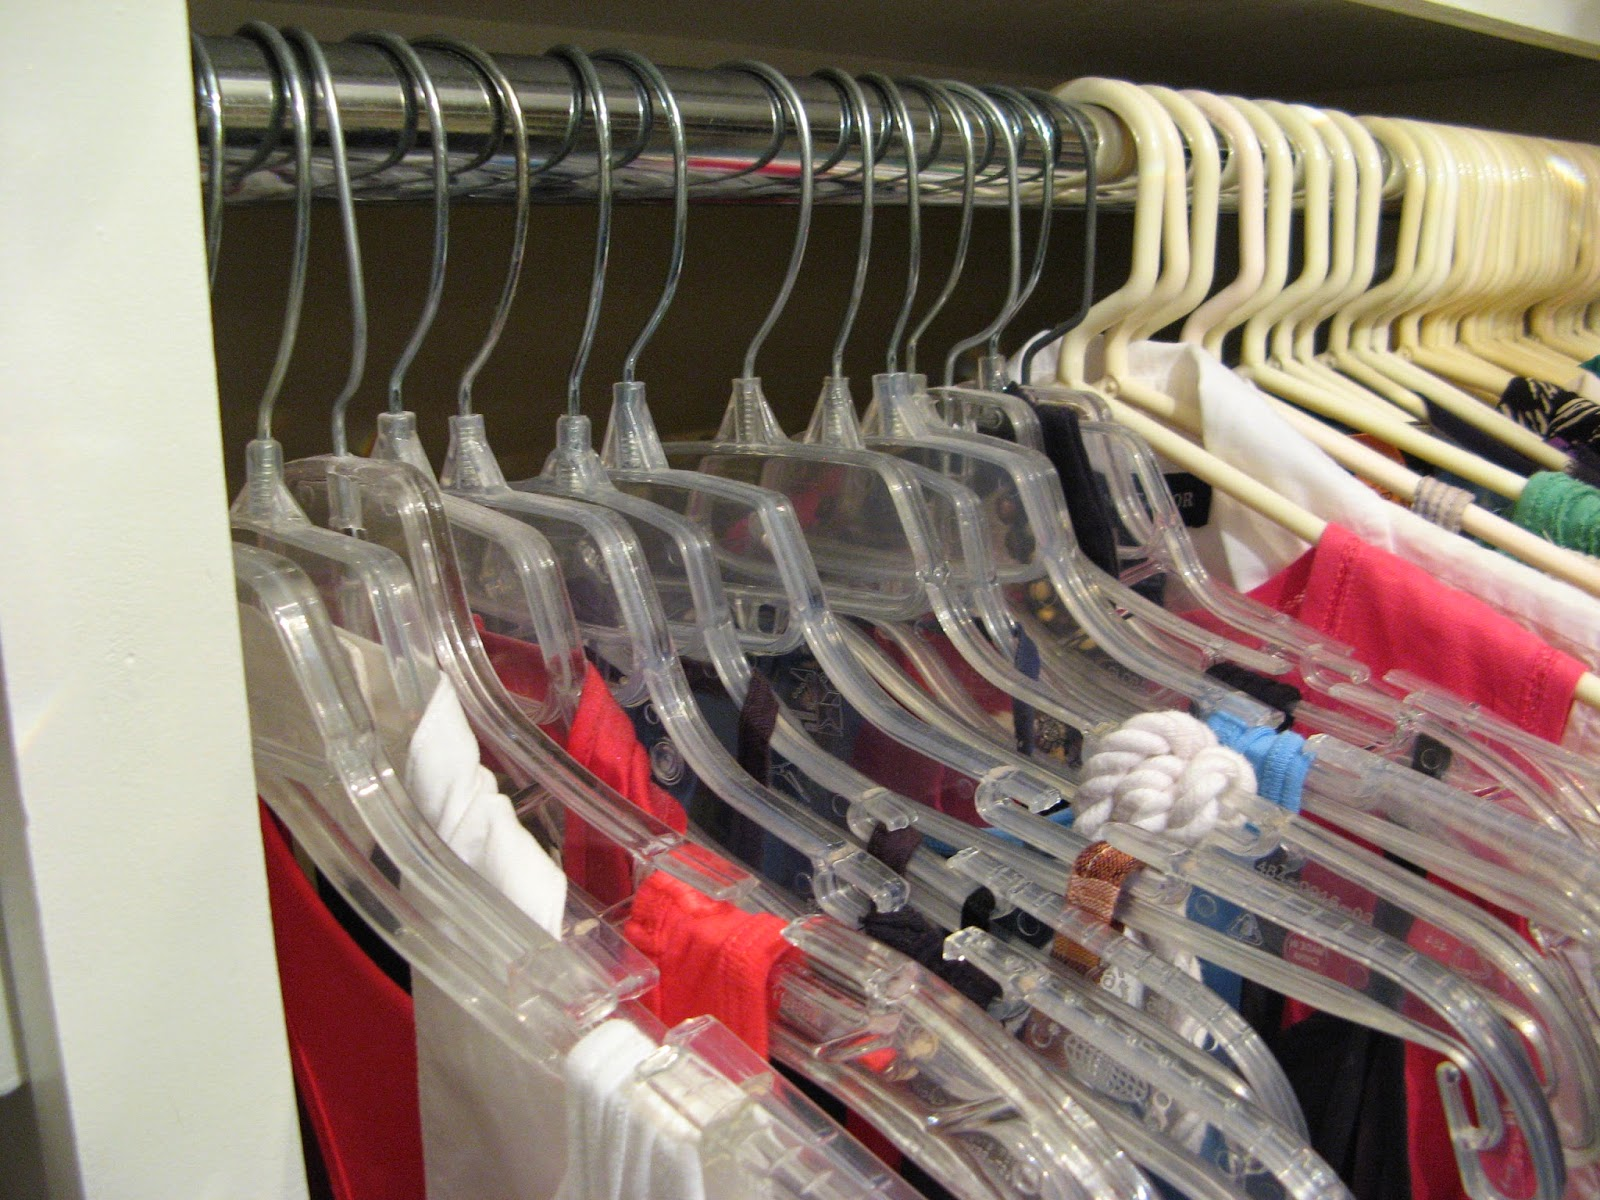 14 Closet Organizing Tips - HANGERS